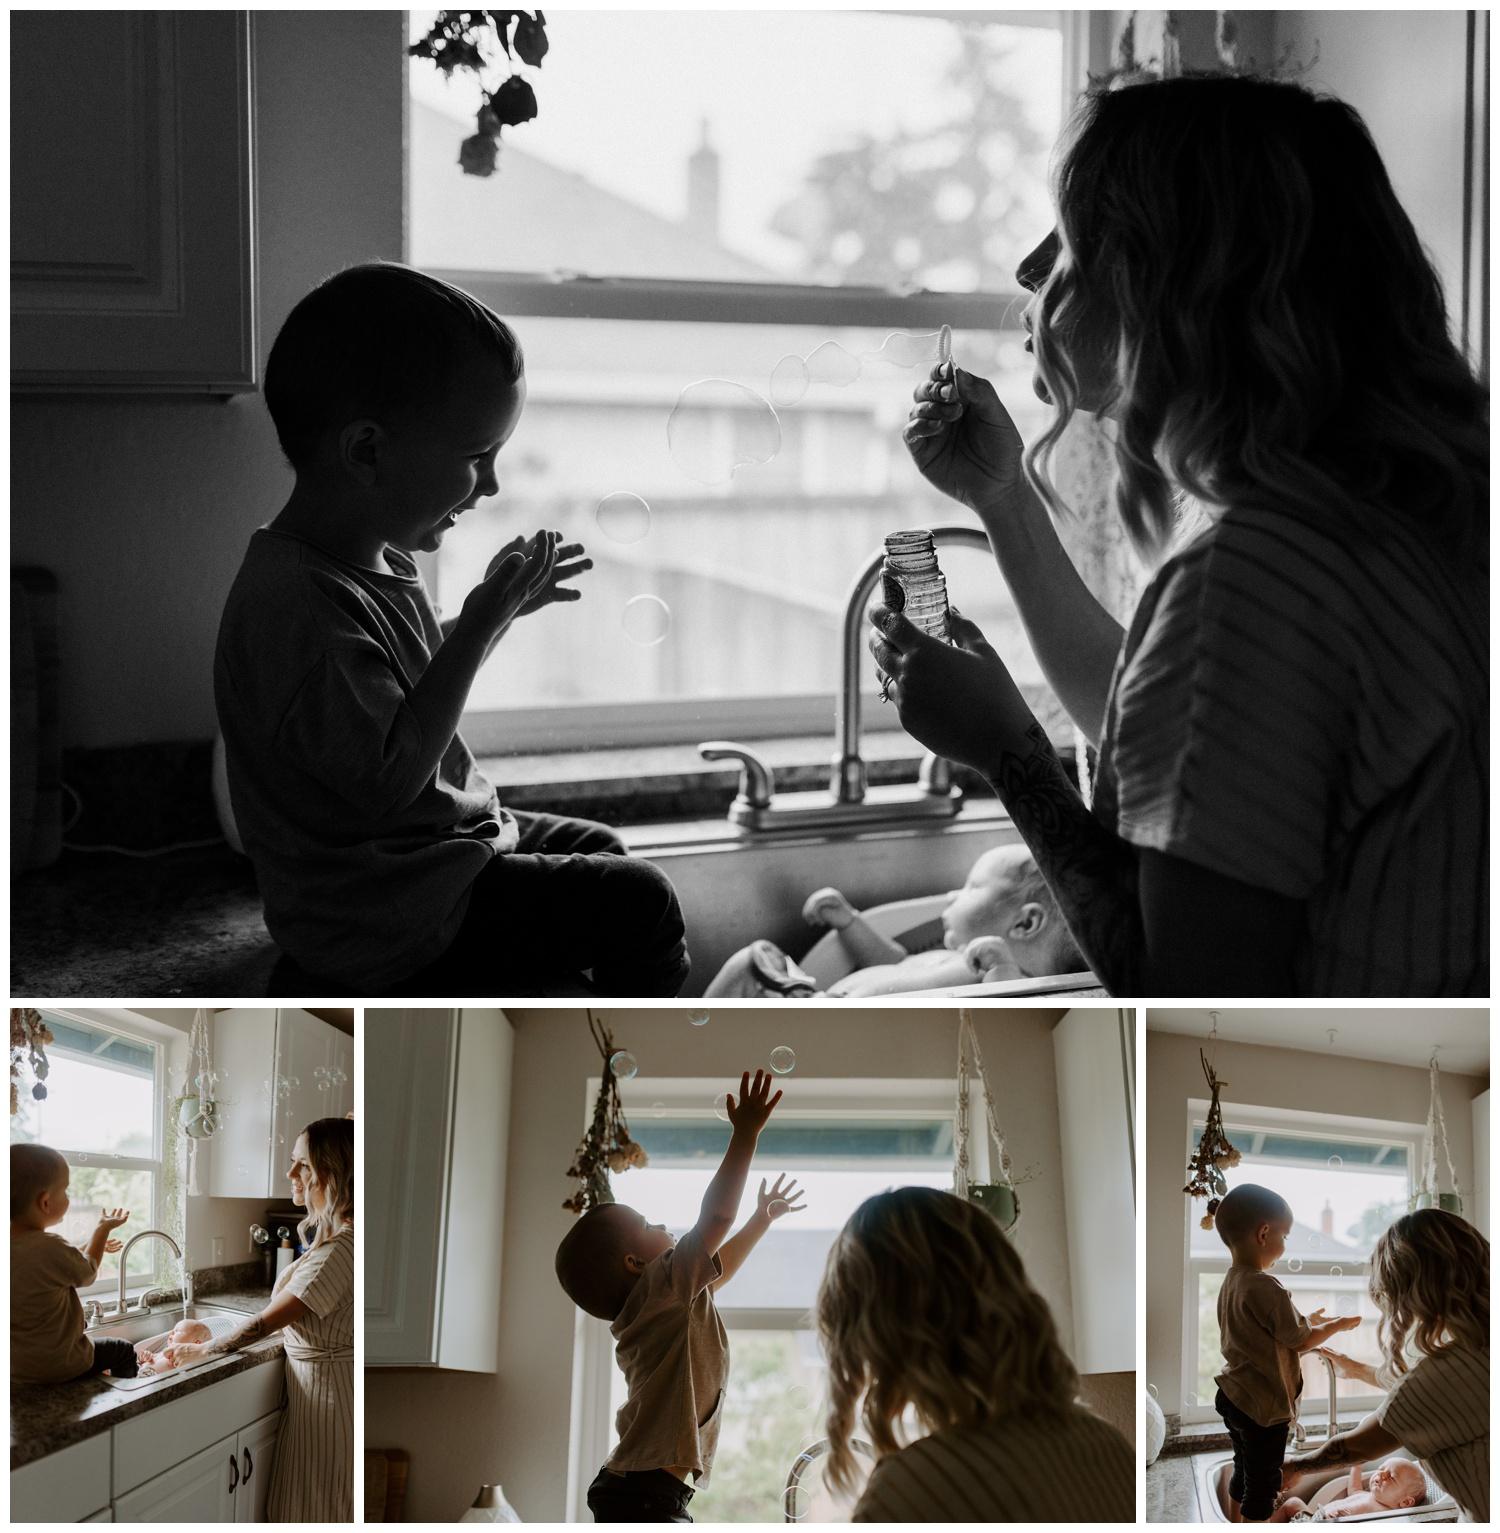 In Home newborn Session | Washington Lifestyle Family Photographer Jessica Heron Images | jessicaheronimages.com | Sink Bath Newborns with siblingsA.JPG